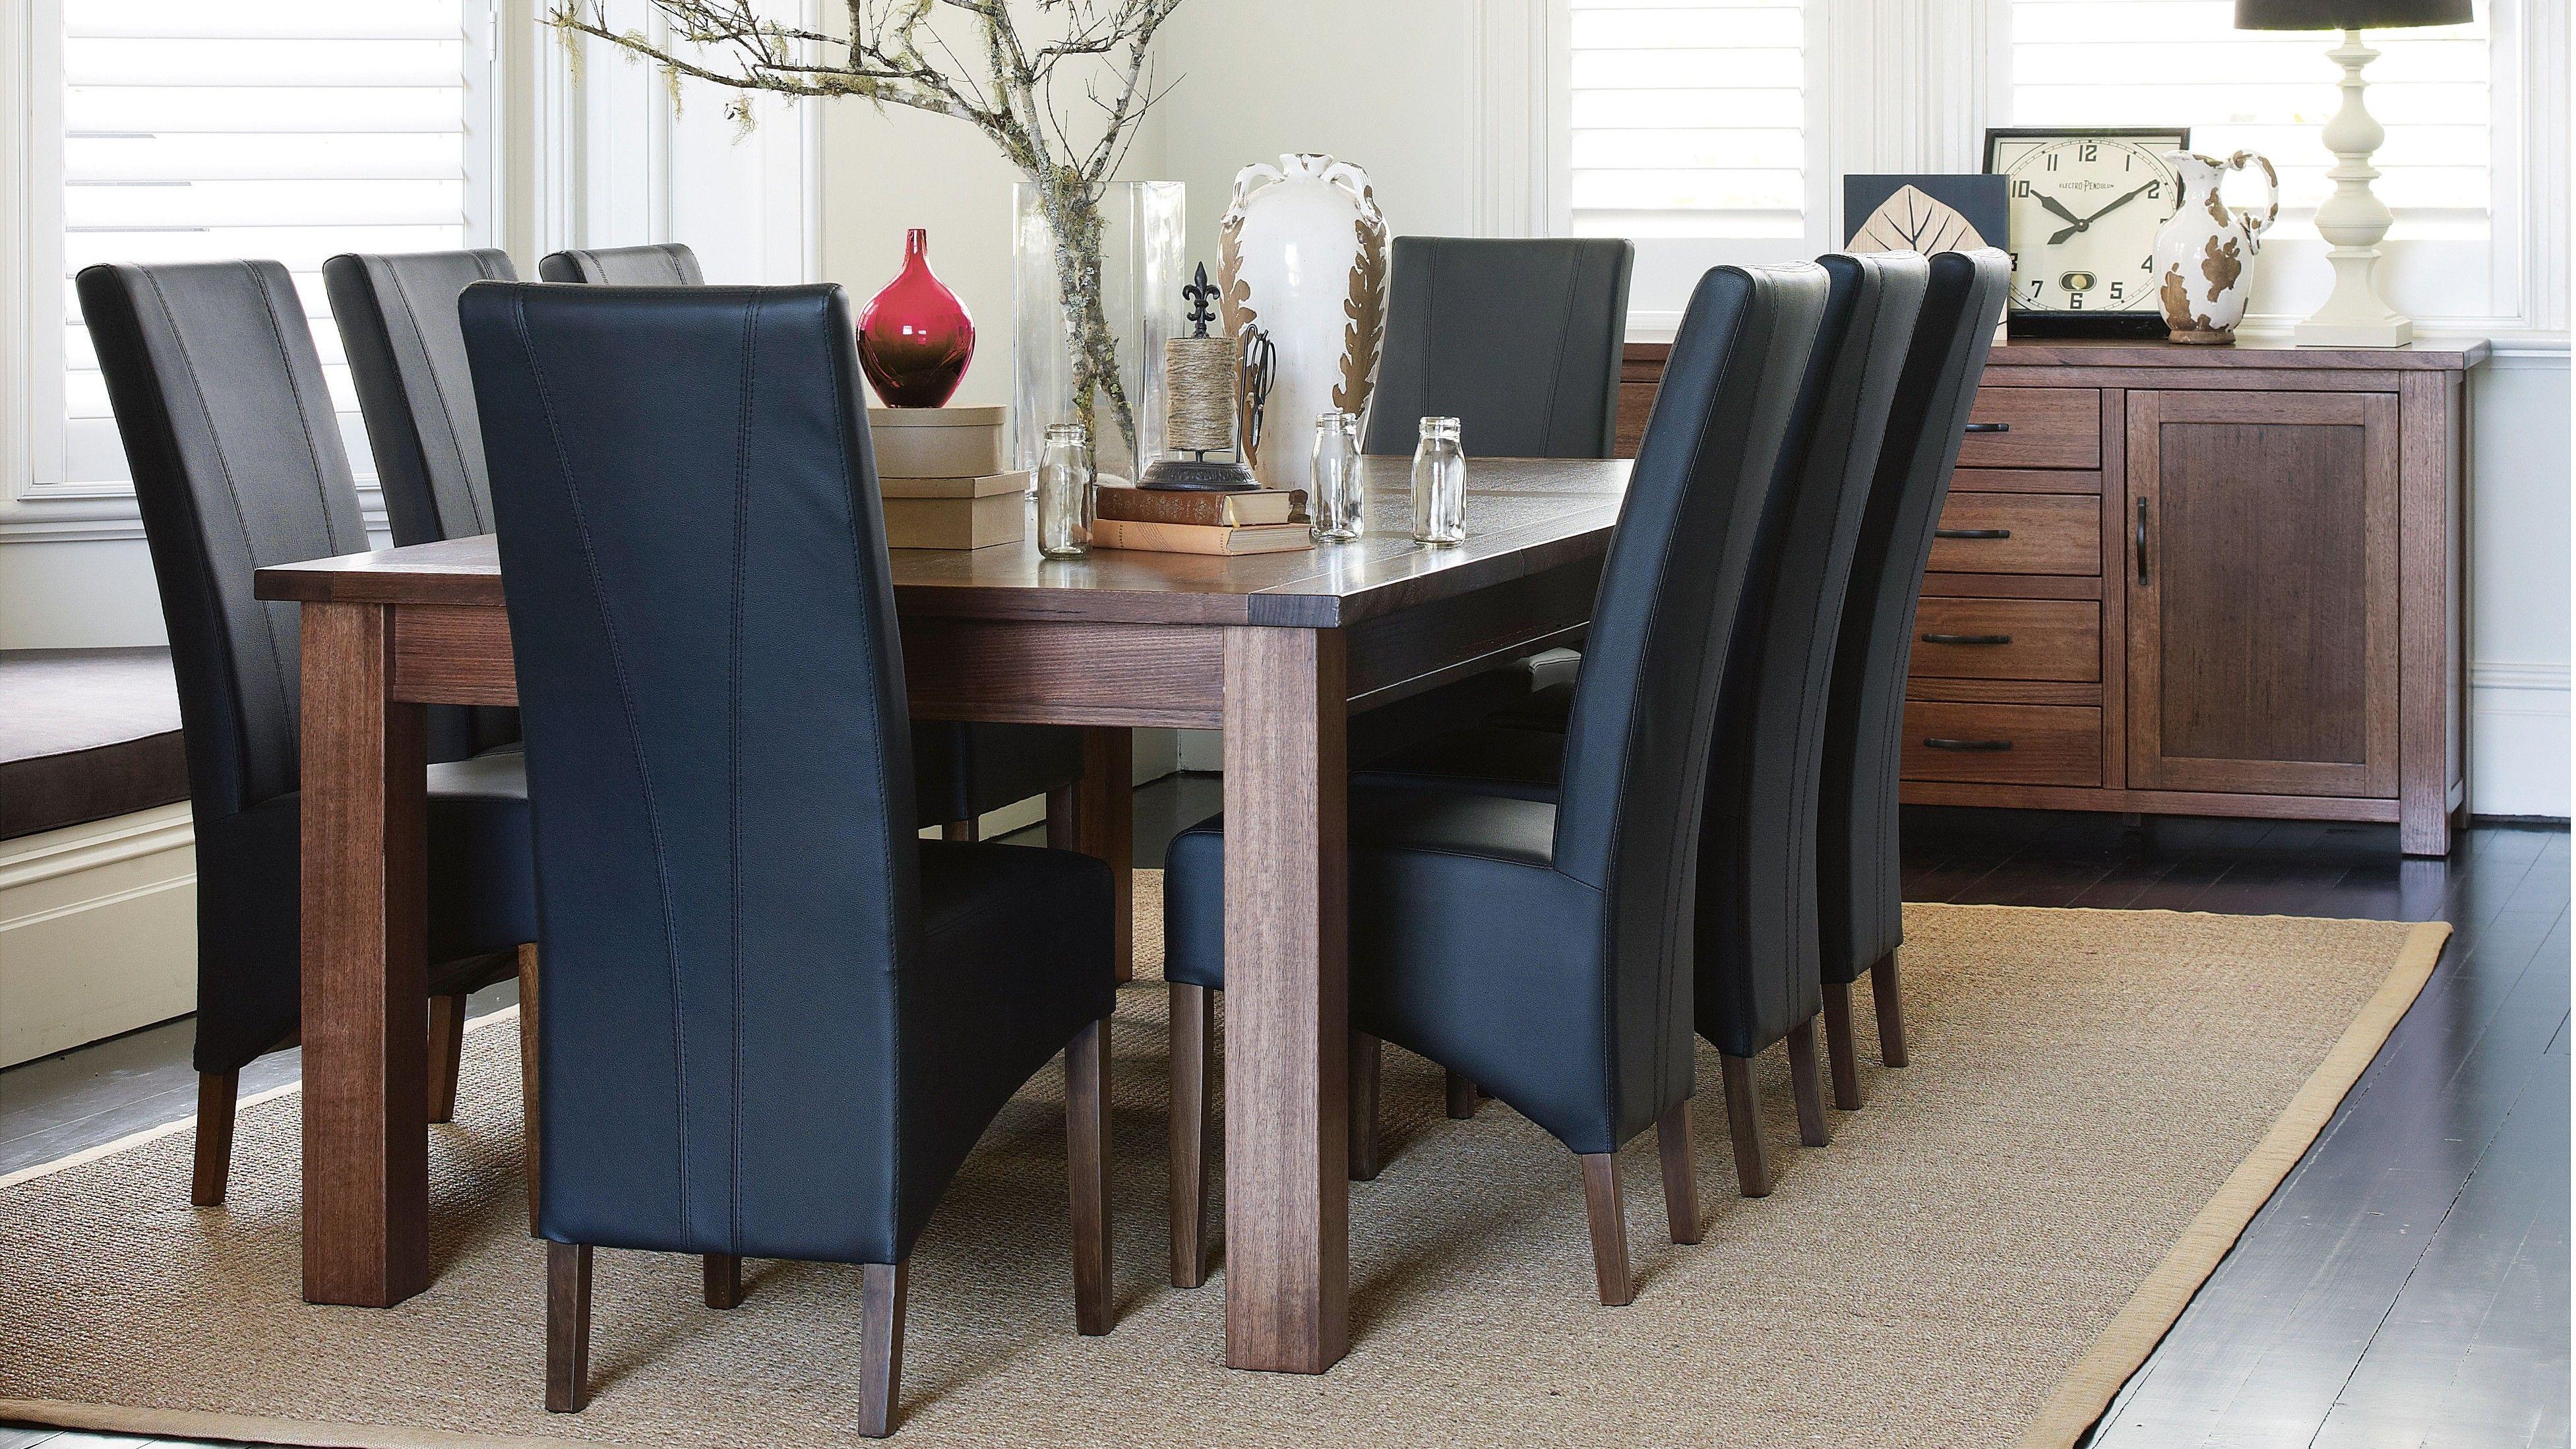 Milano Dining Furniture From Insato Harvey Norman New Zealand